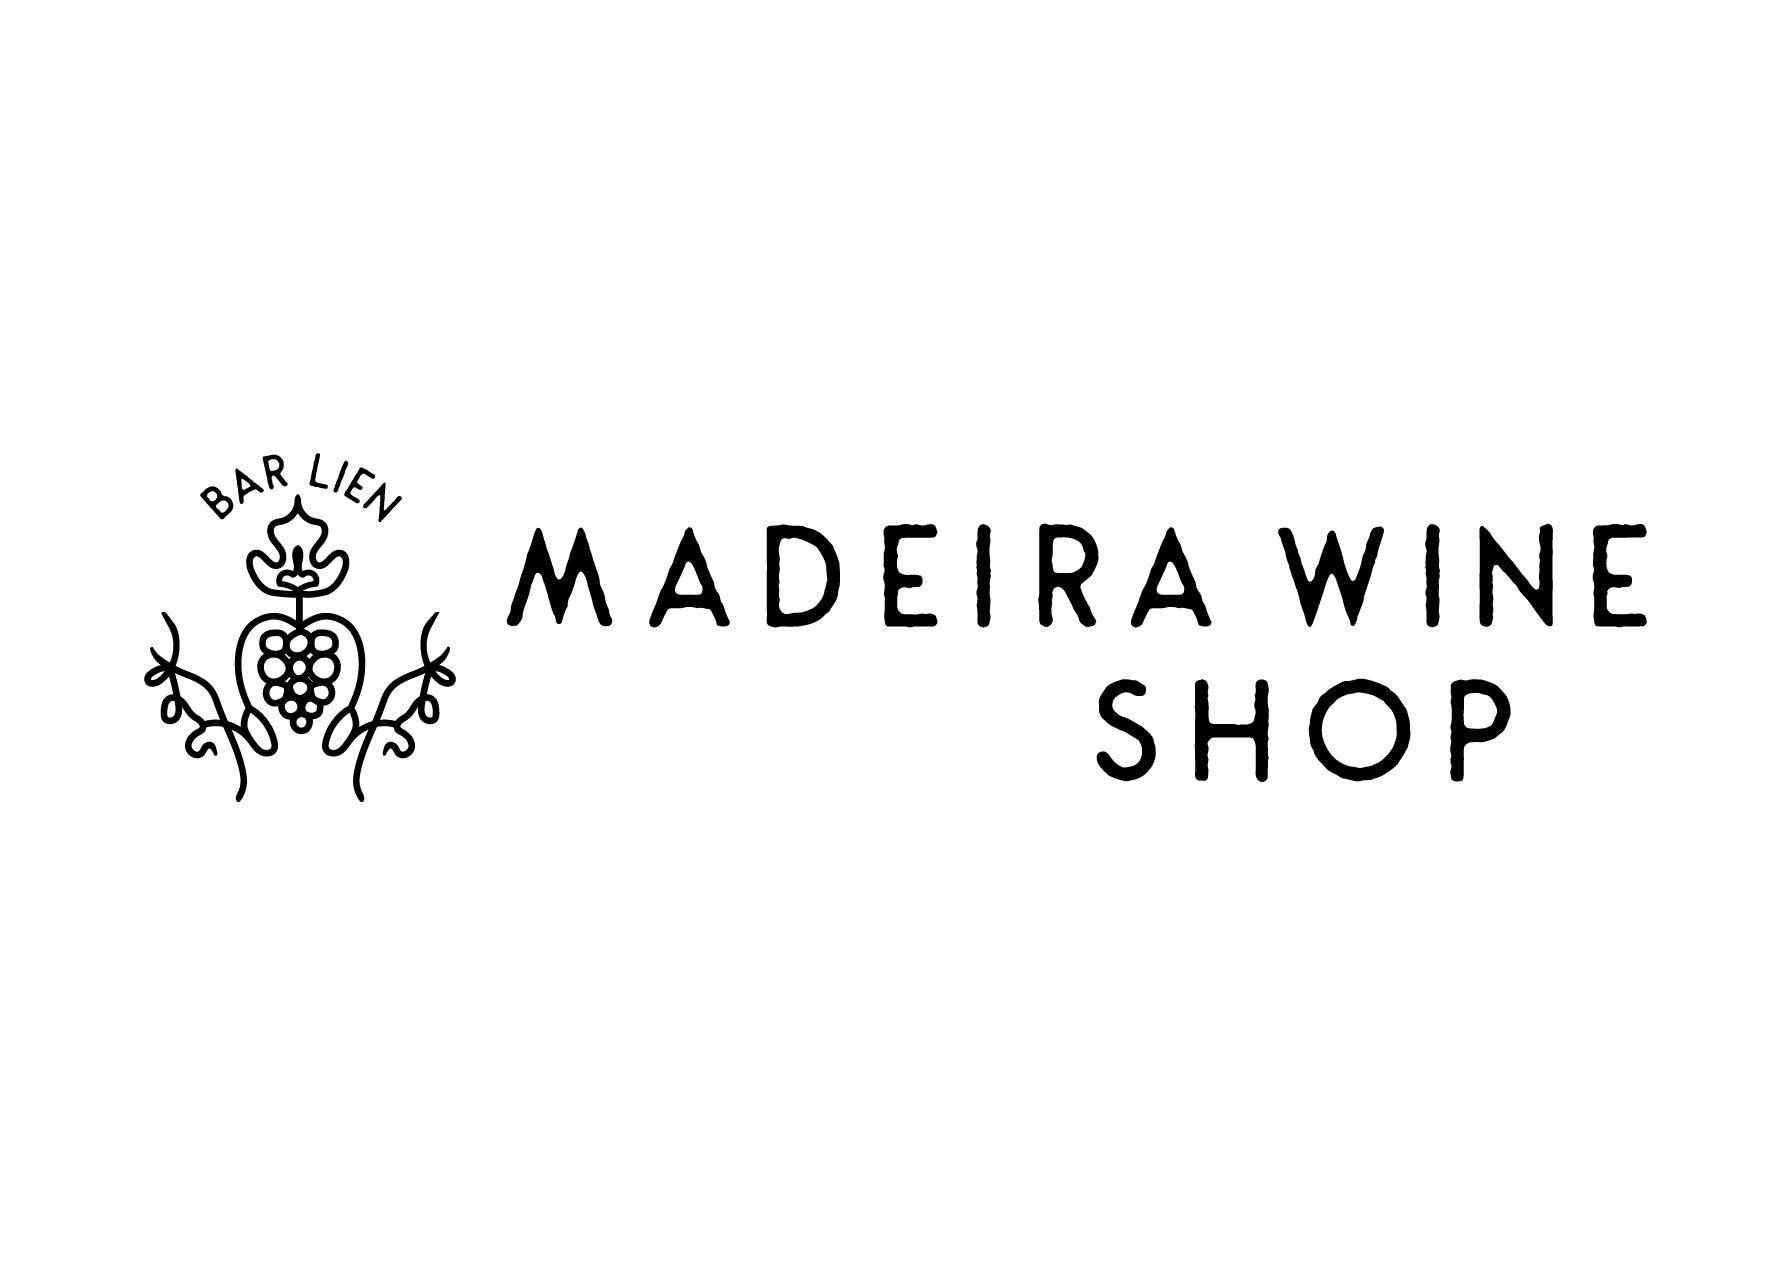 MADEIRA WINE SHOP